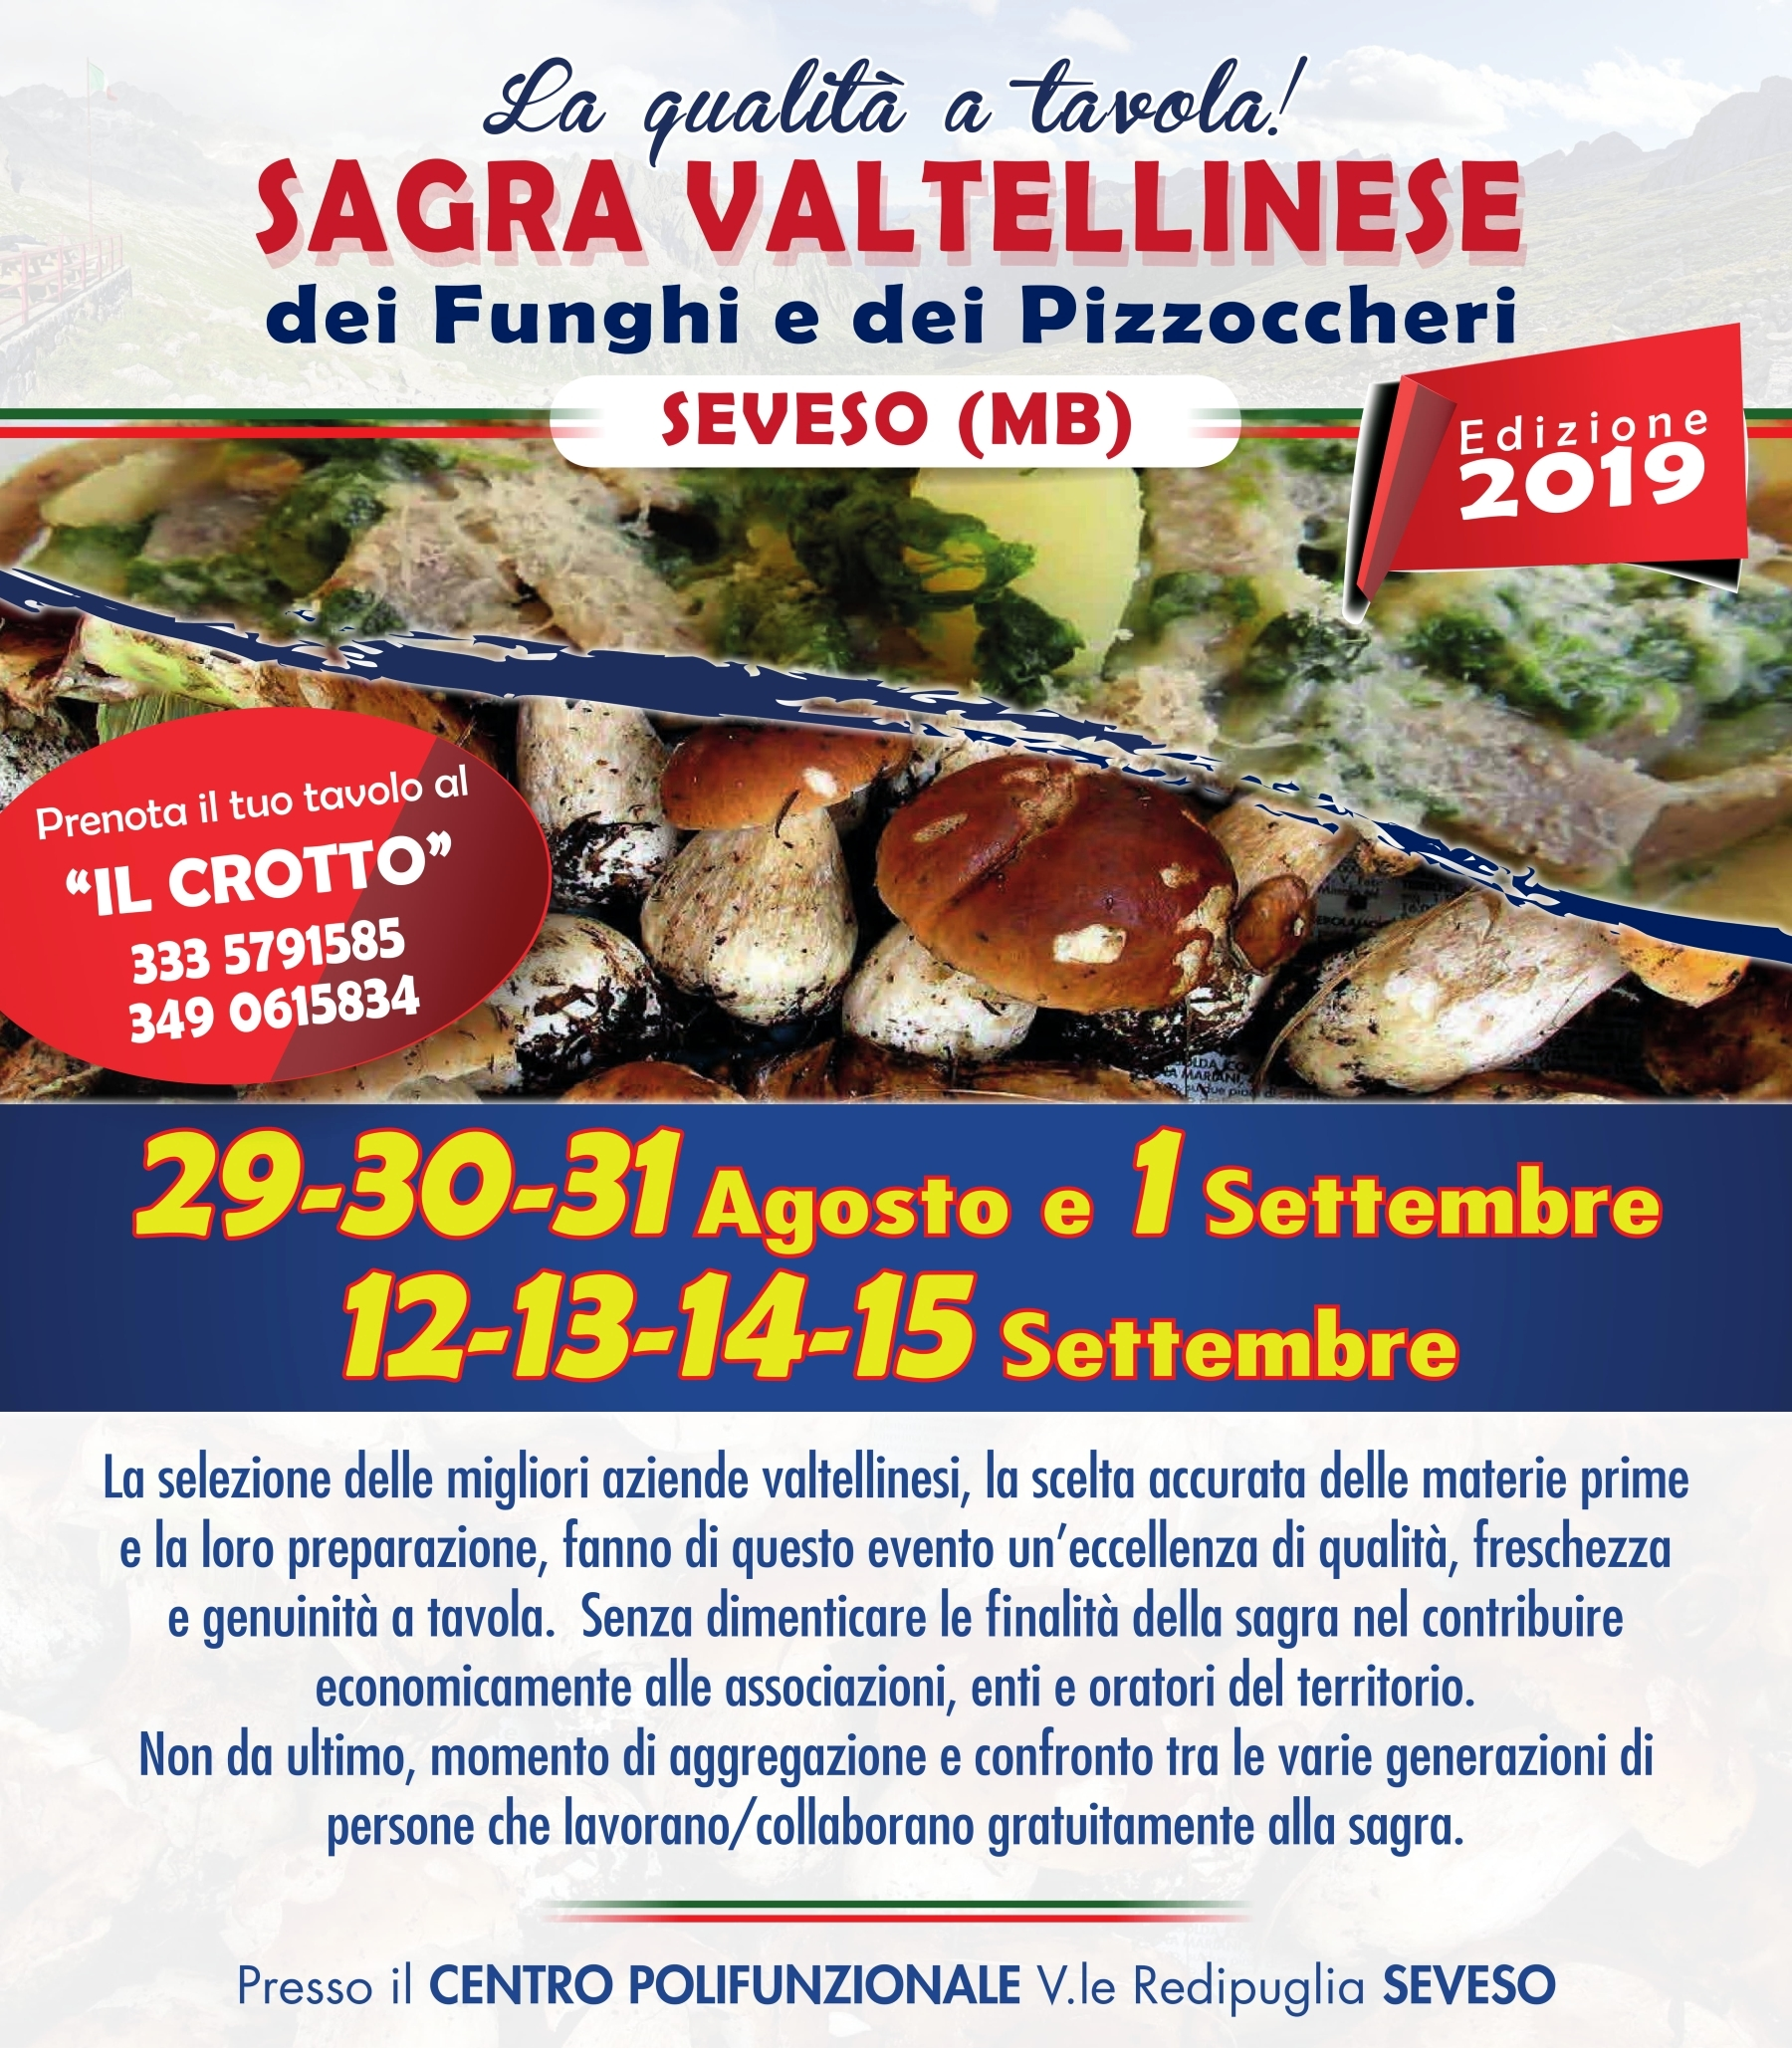 sagra-valtellinese-2019---locandina-2